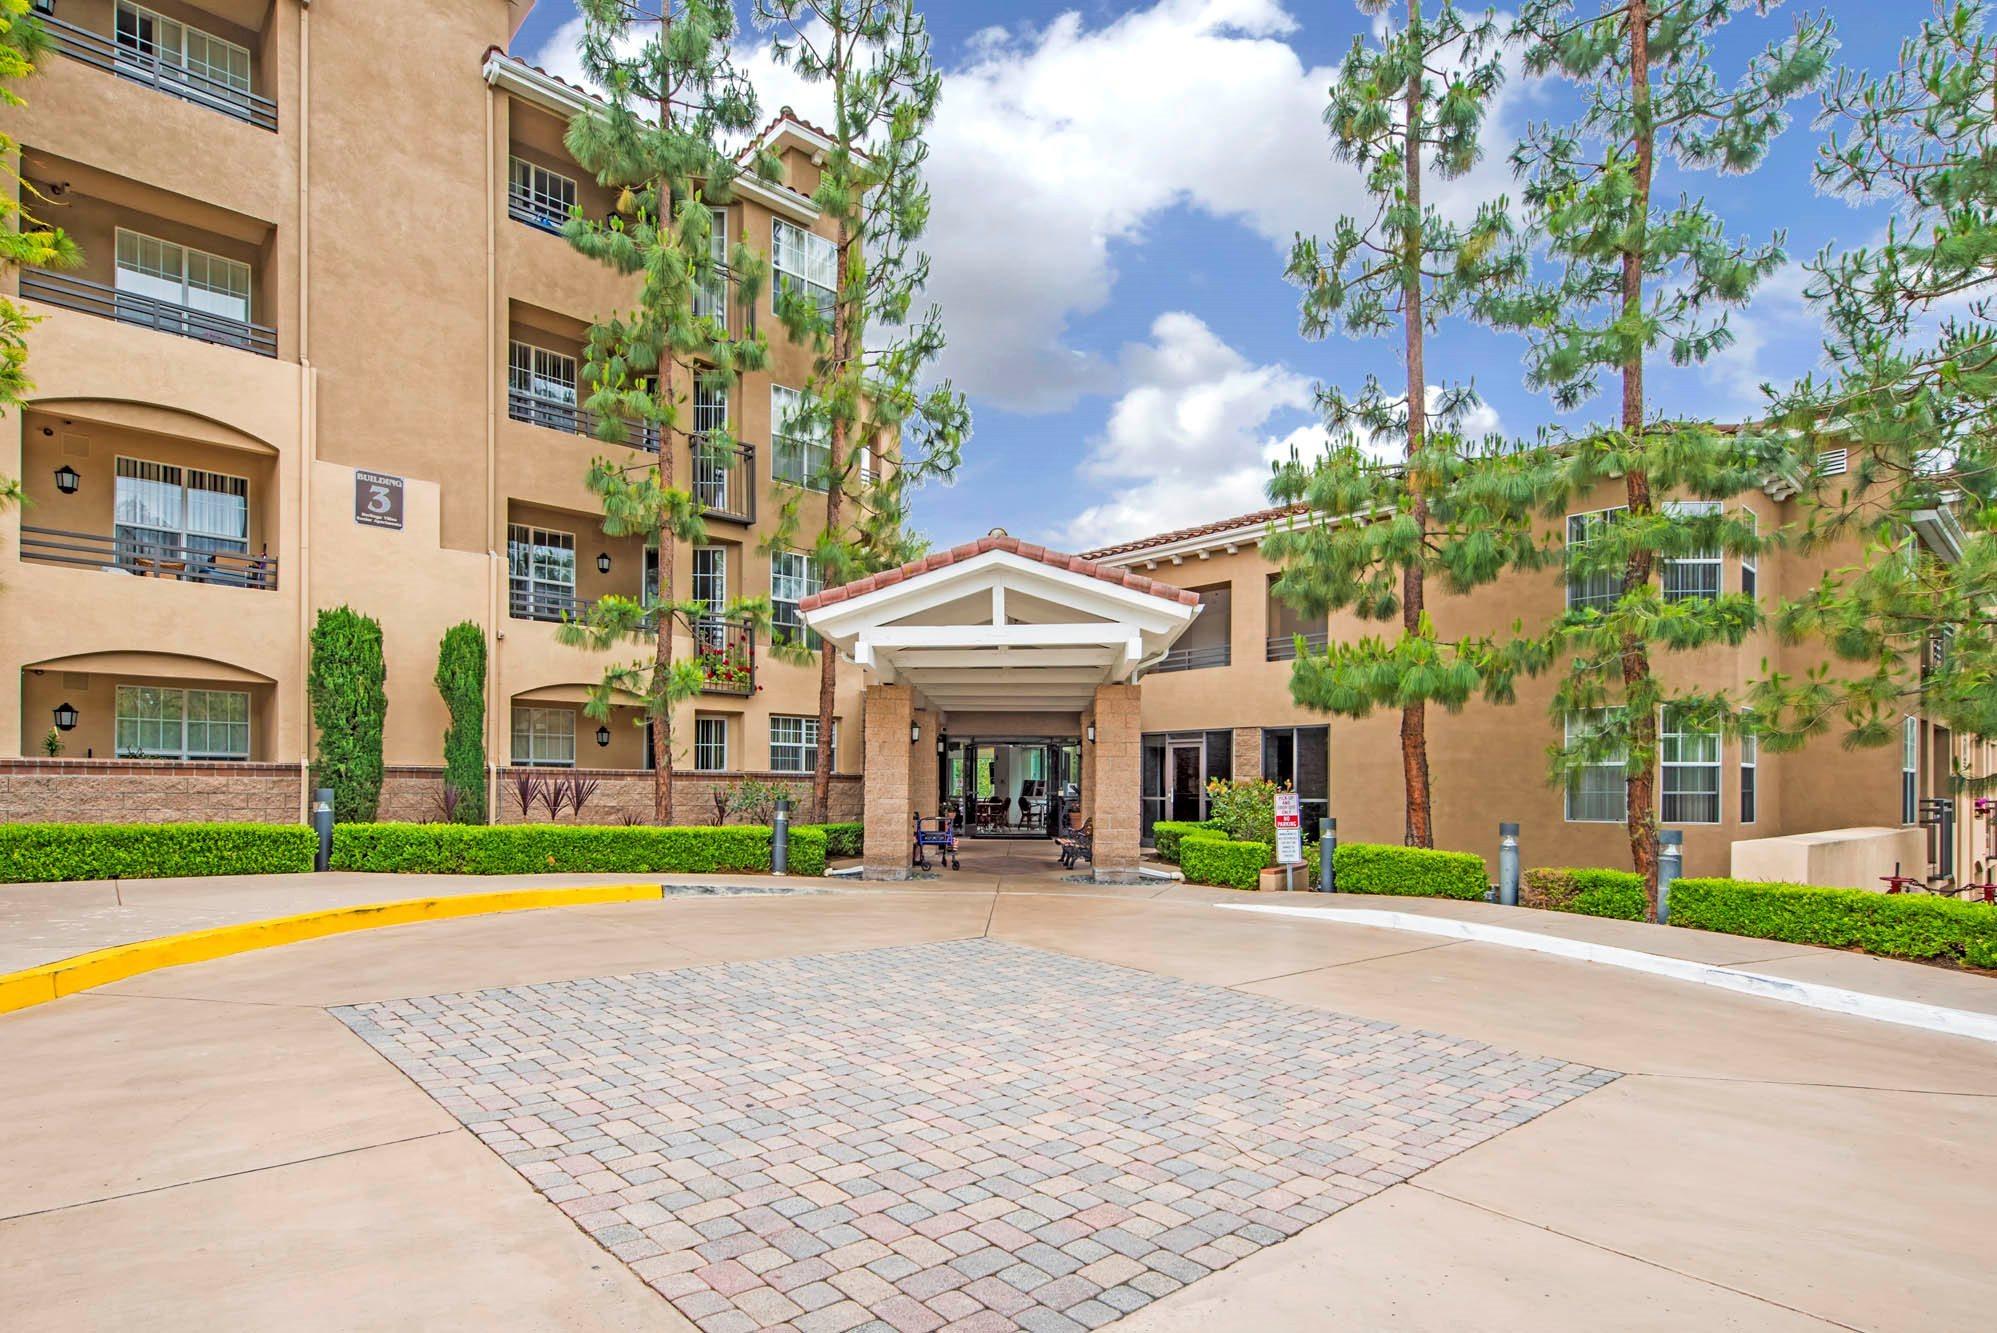 Image of Heritage Villas Senior Apartments in Mission Viejo, California